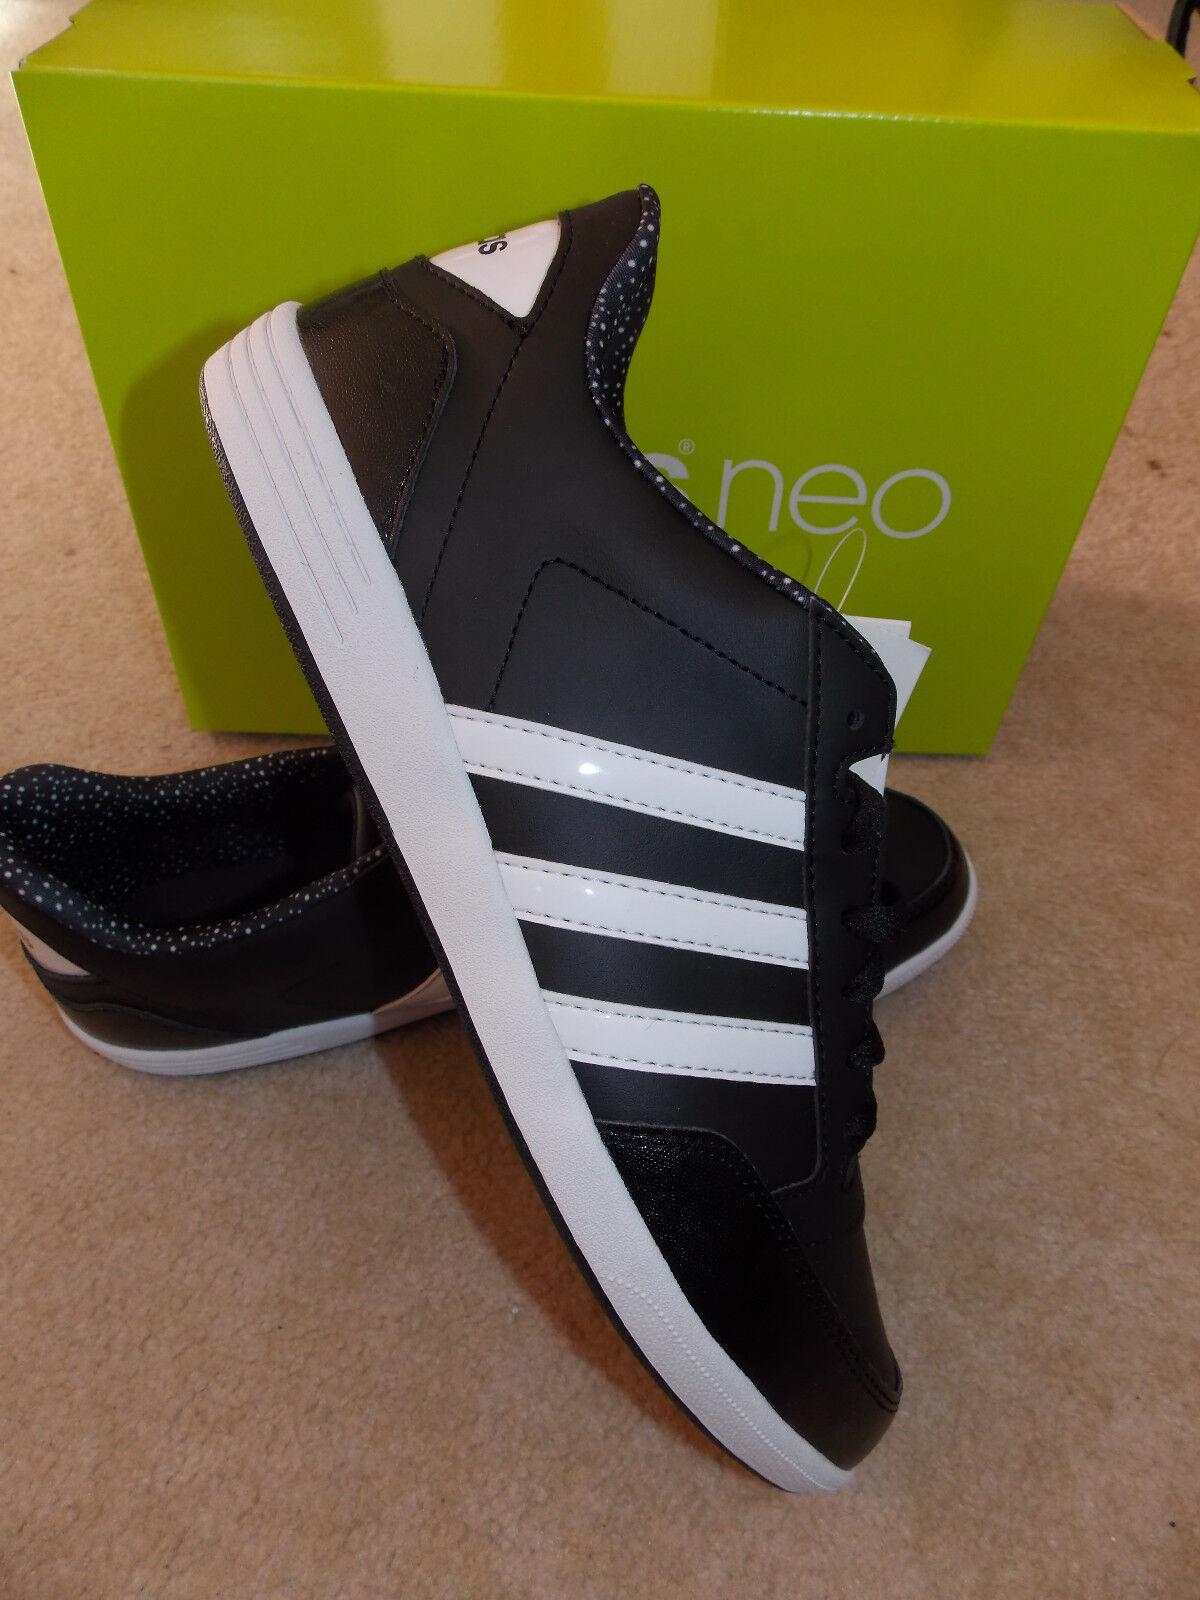 Adidas Frauen Tunrschuhe schwarz/weiß adidasNEO UK